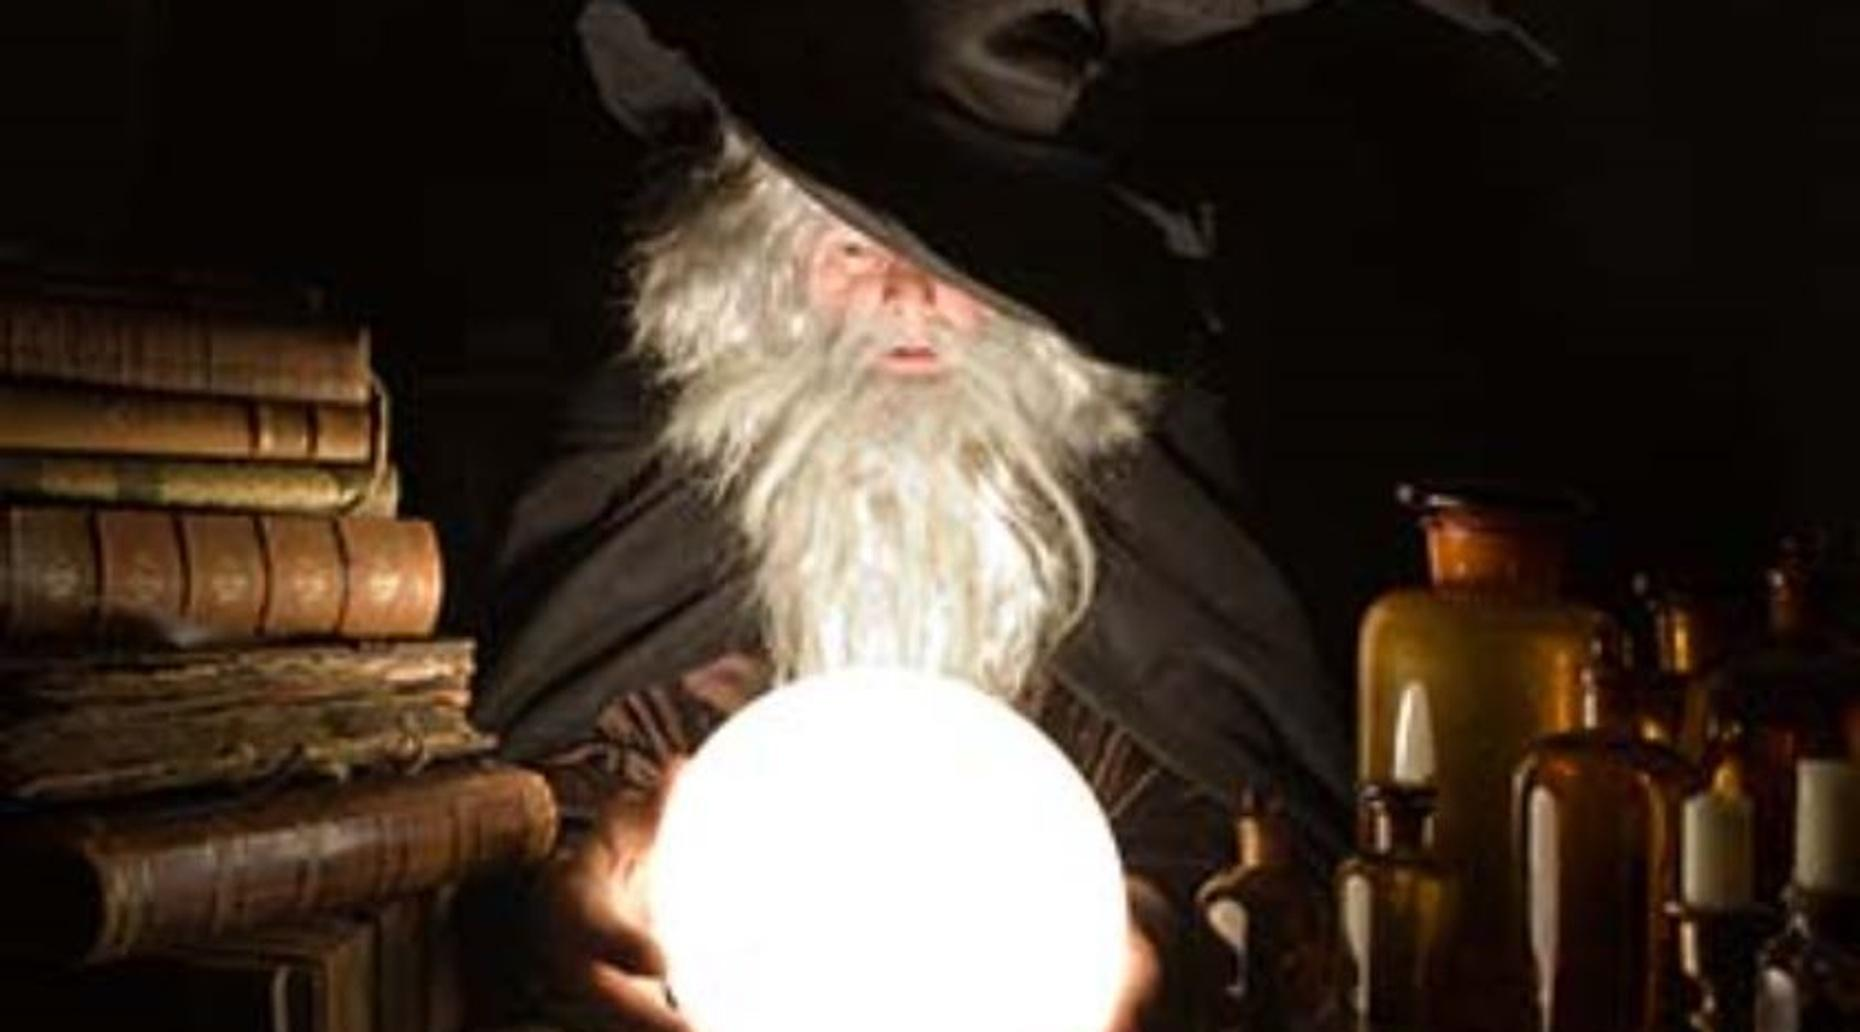 Conjurer's Dungeon Escape Room Game in Garner